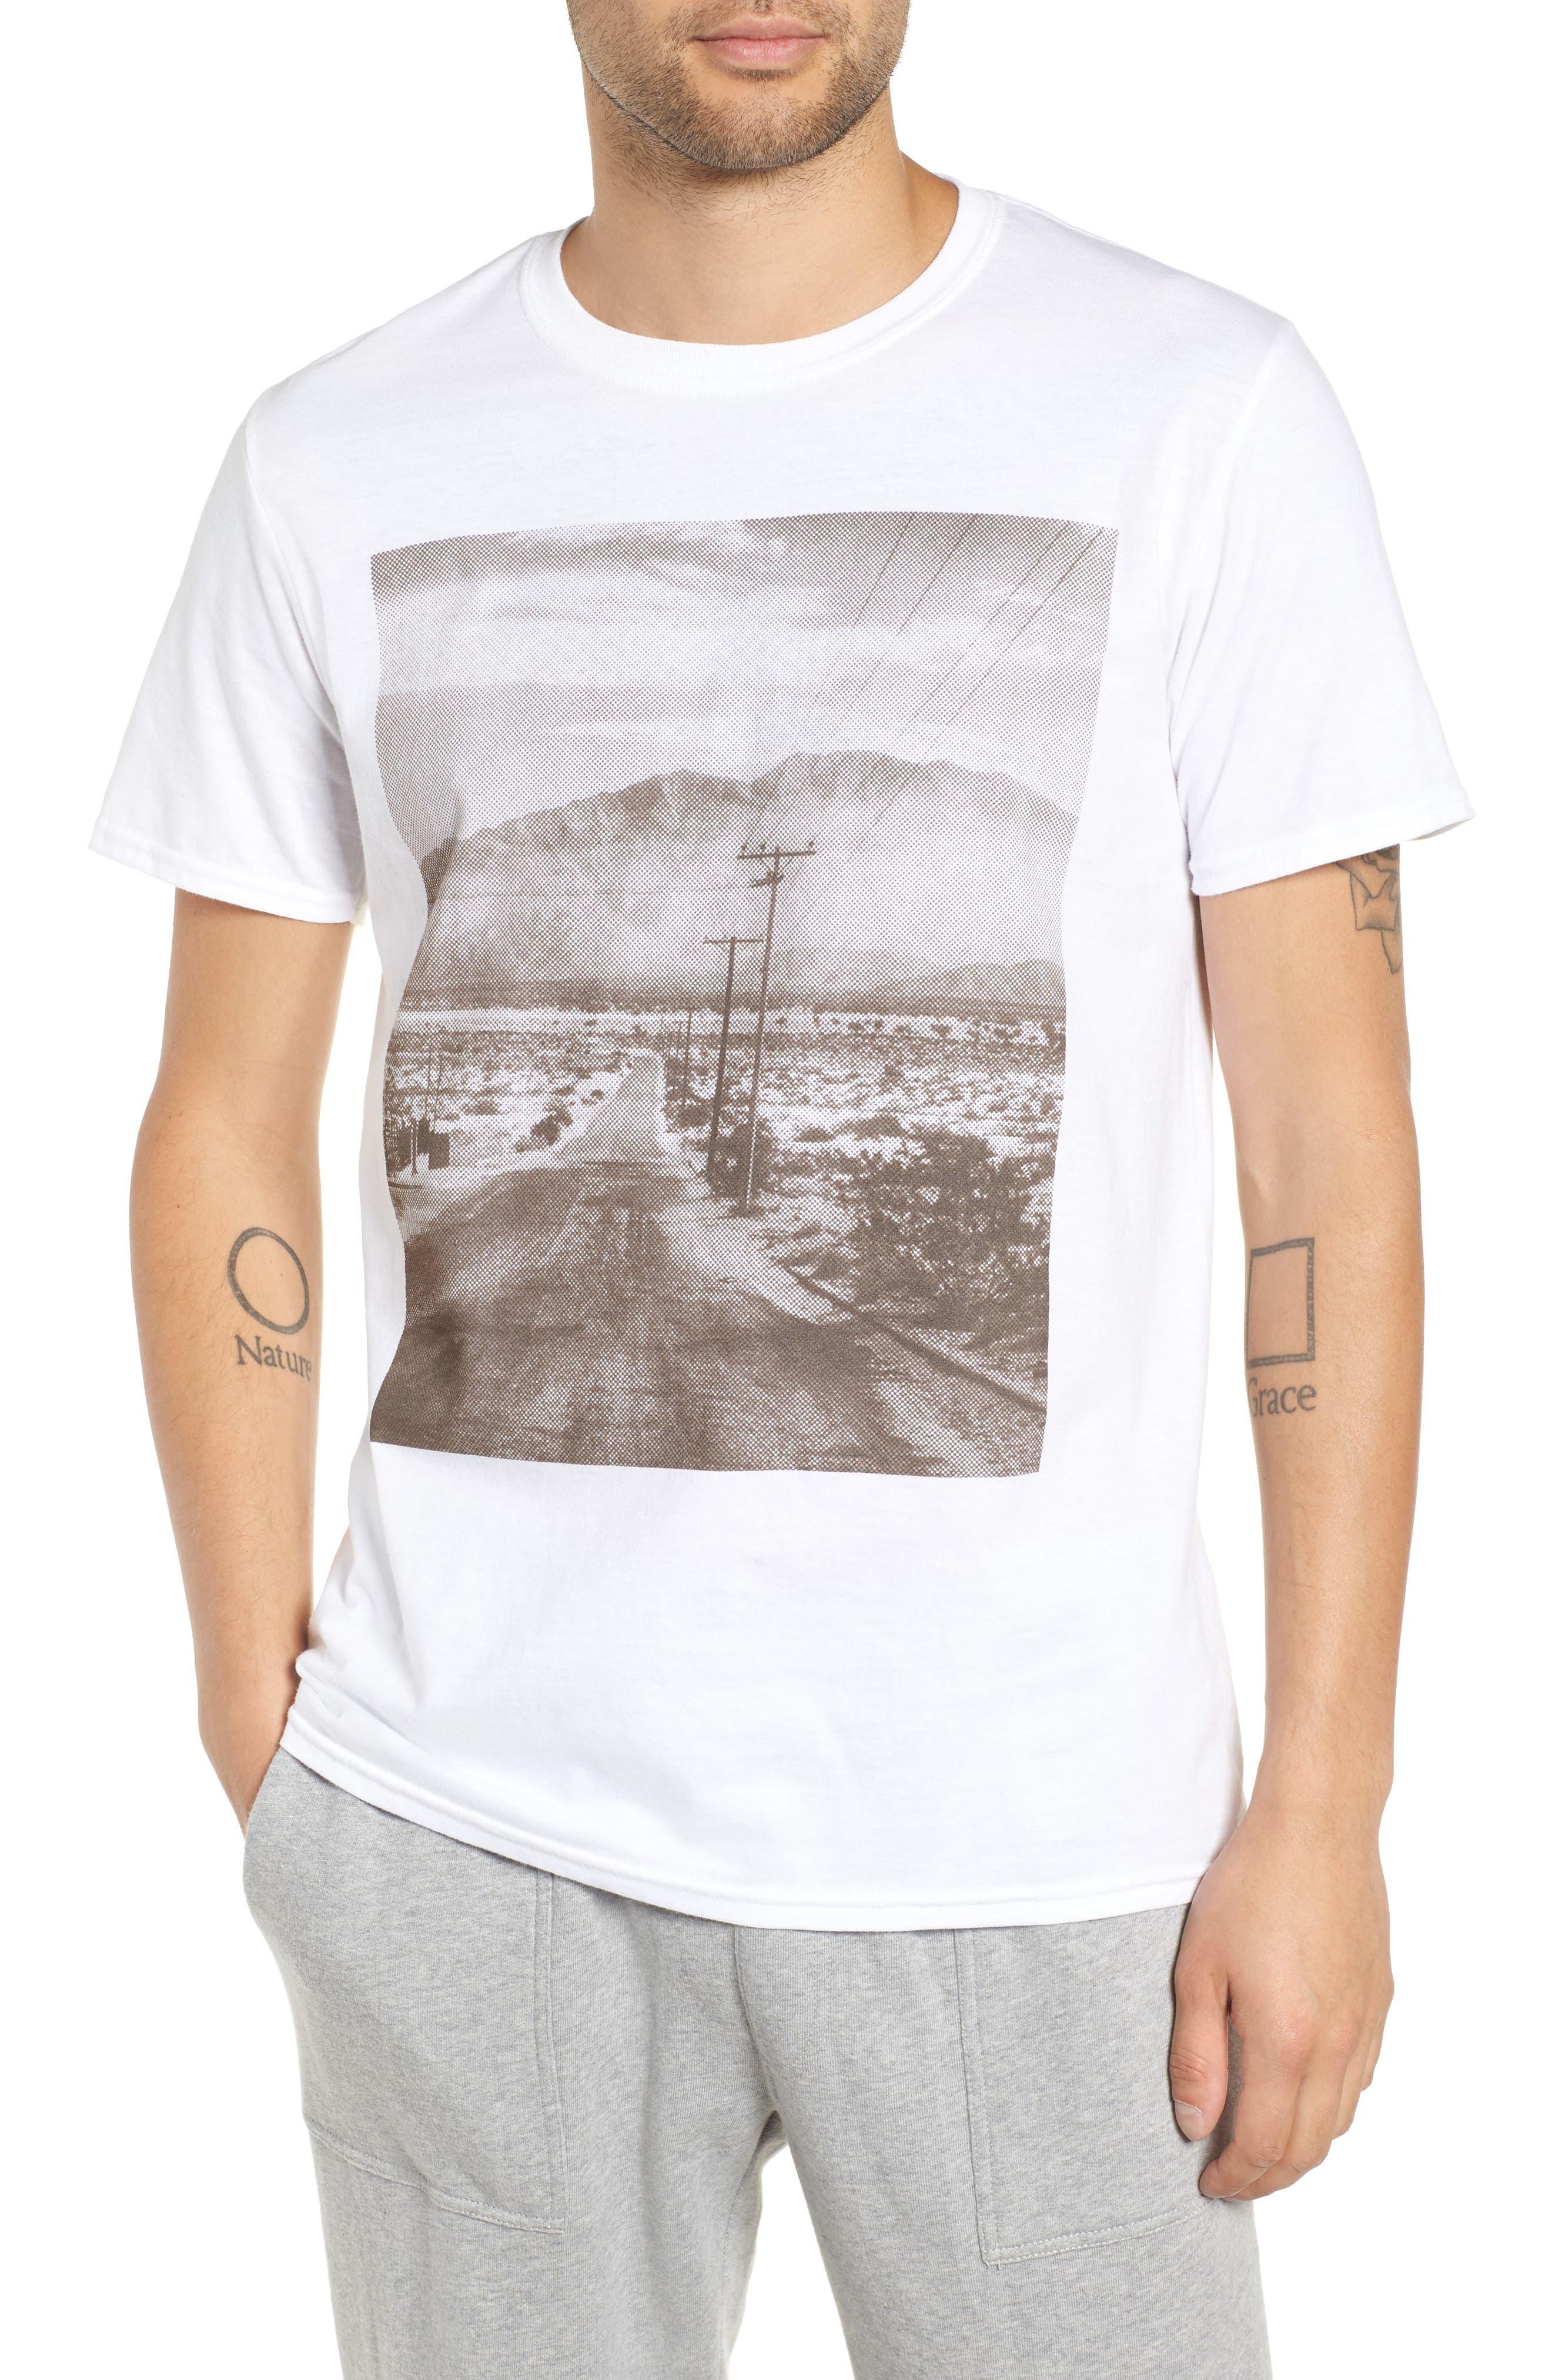 Deserted Road Photo T-Shirt,                             Main thumbnail 1, color,                             100